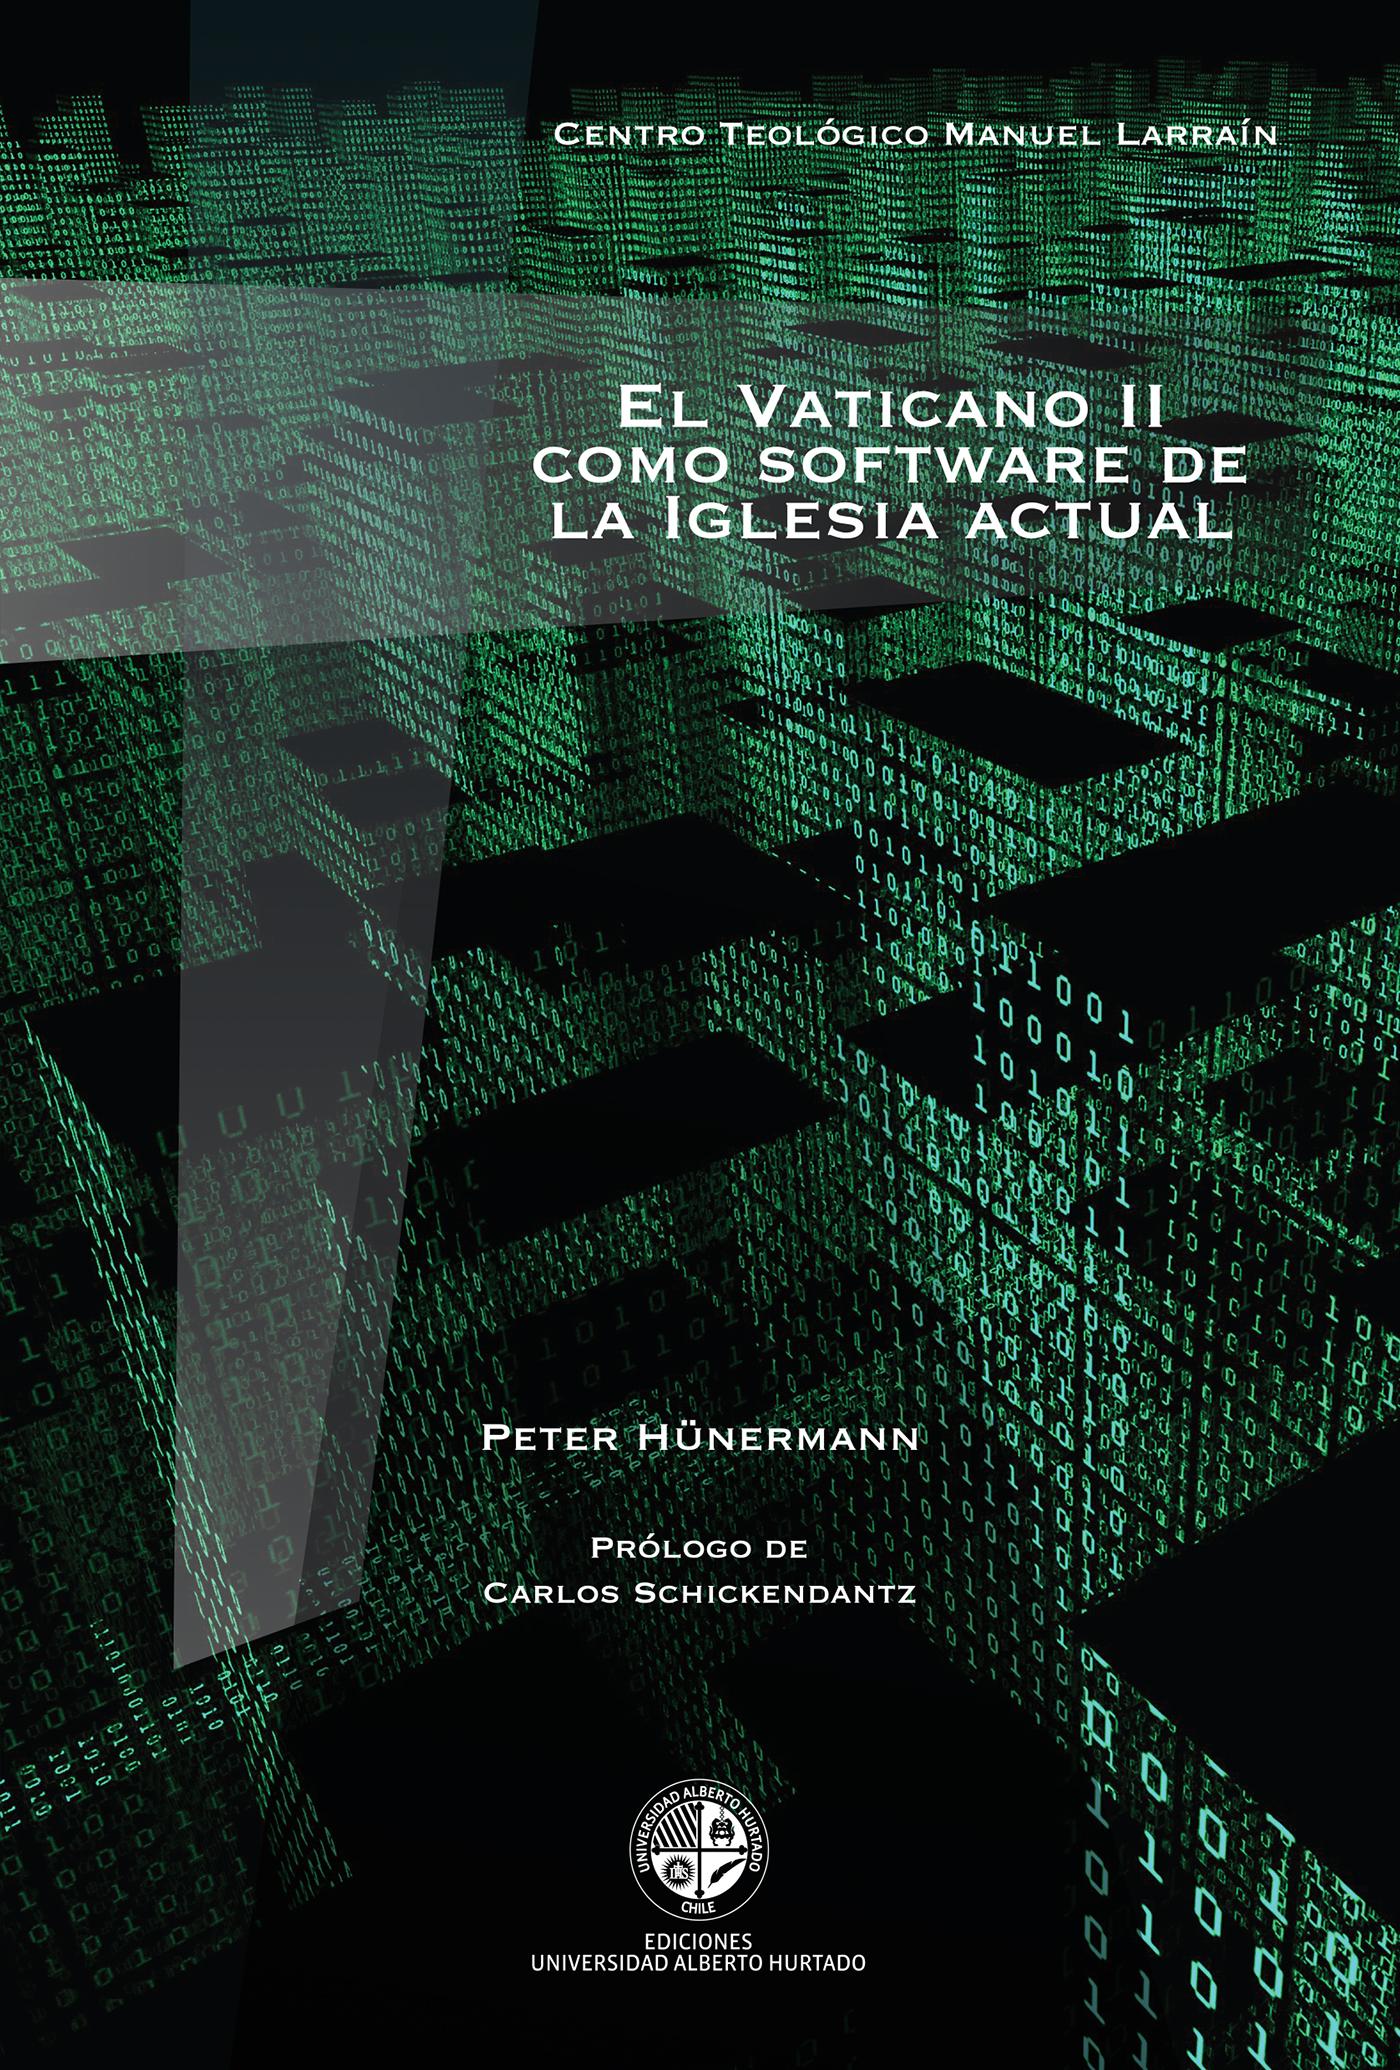 EL VATICANO II COMO SOFTWARE DE LA IGLESIA ACTUAL